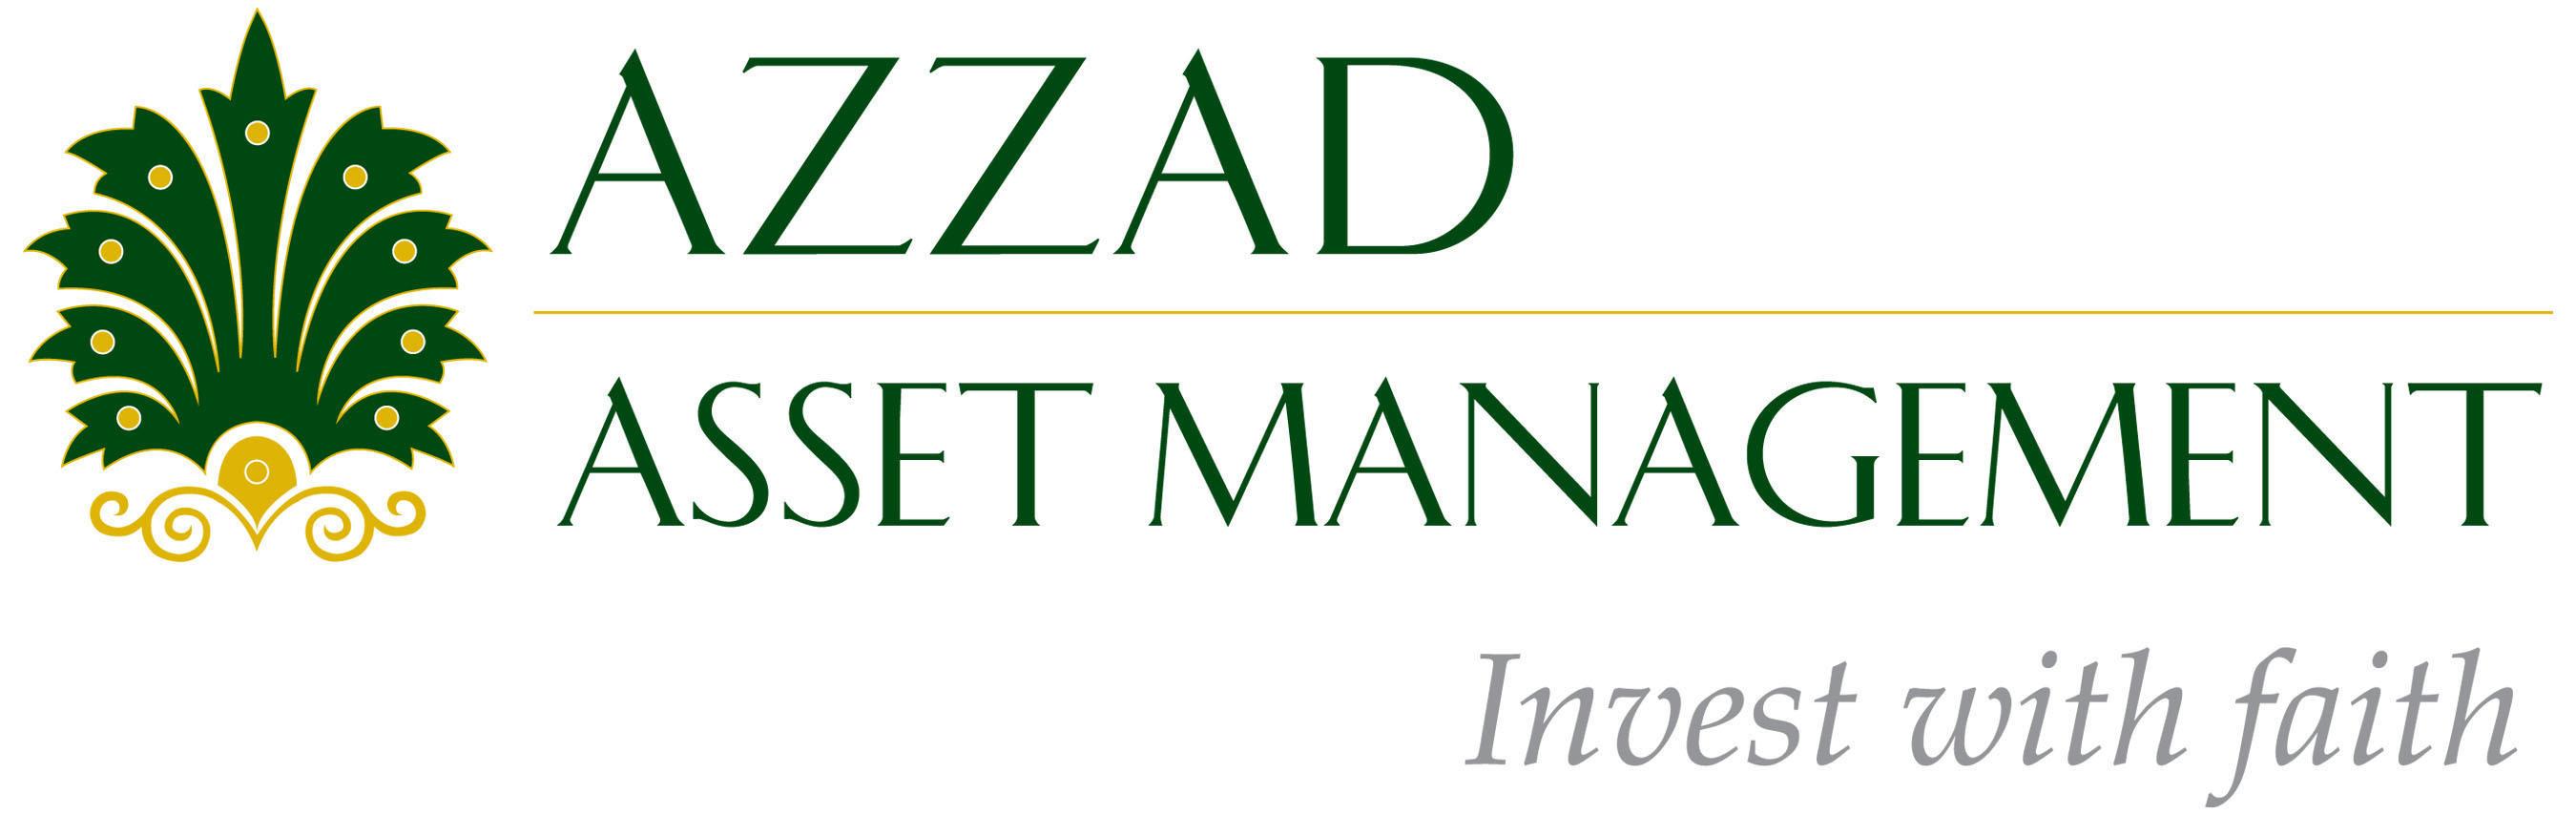 Azzad Asset Management Logo.